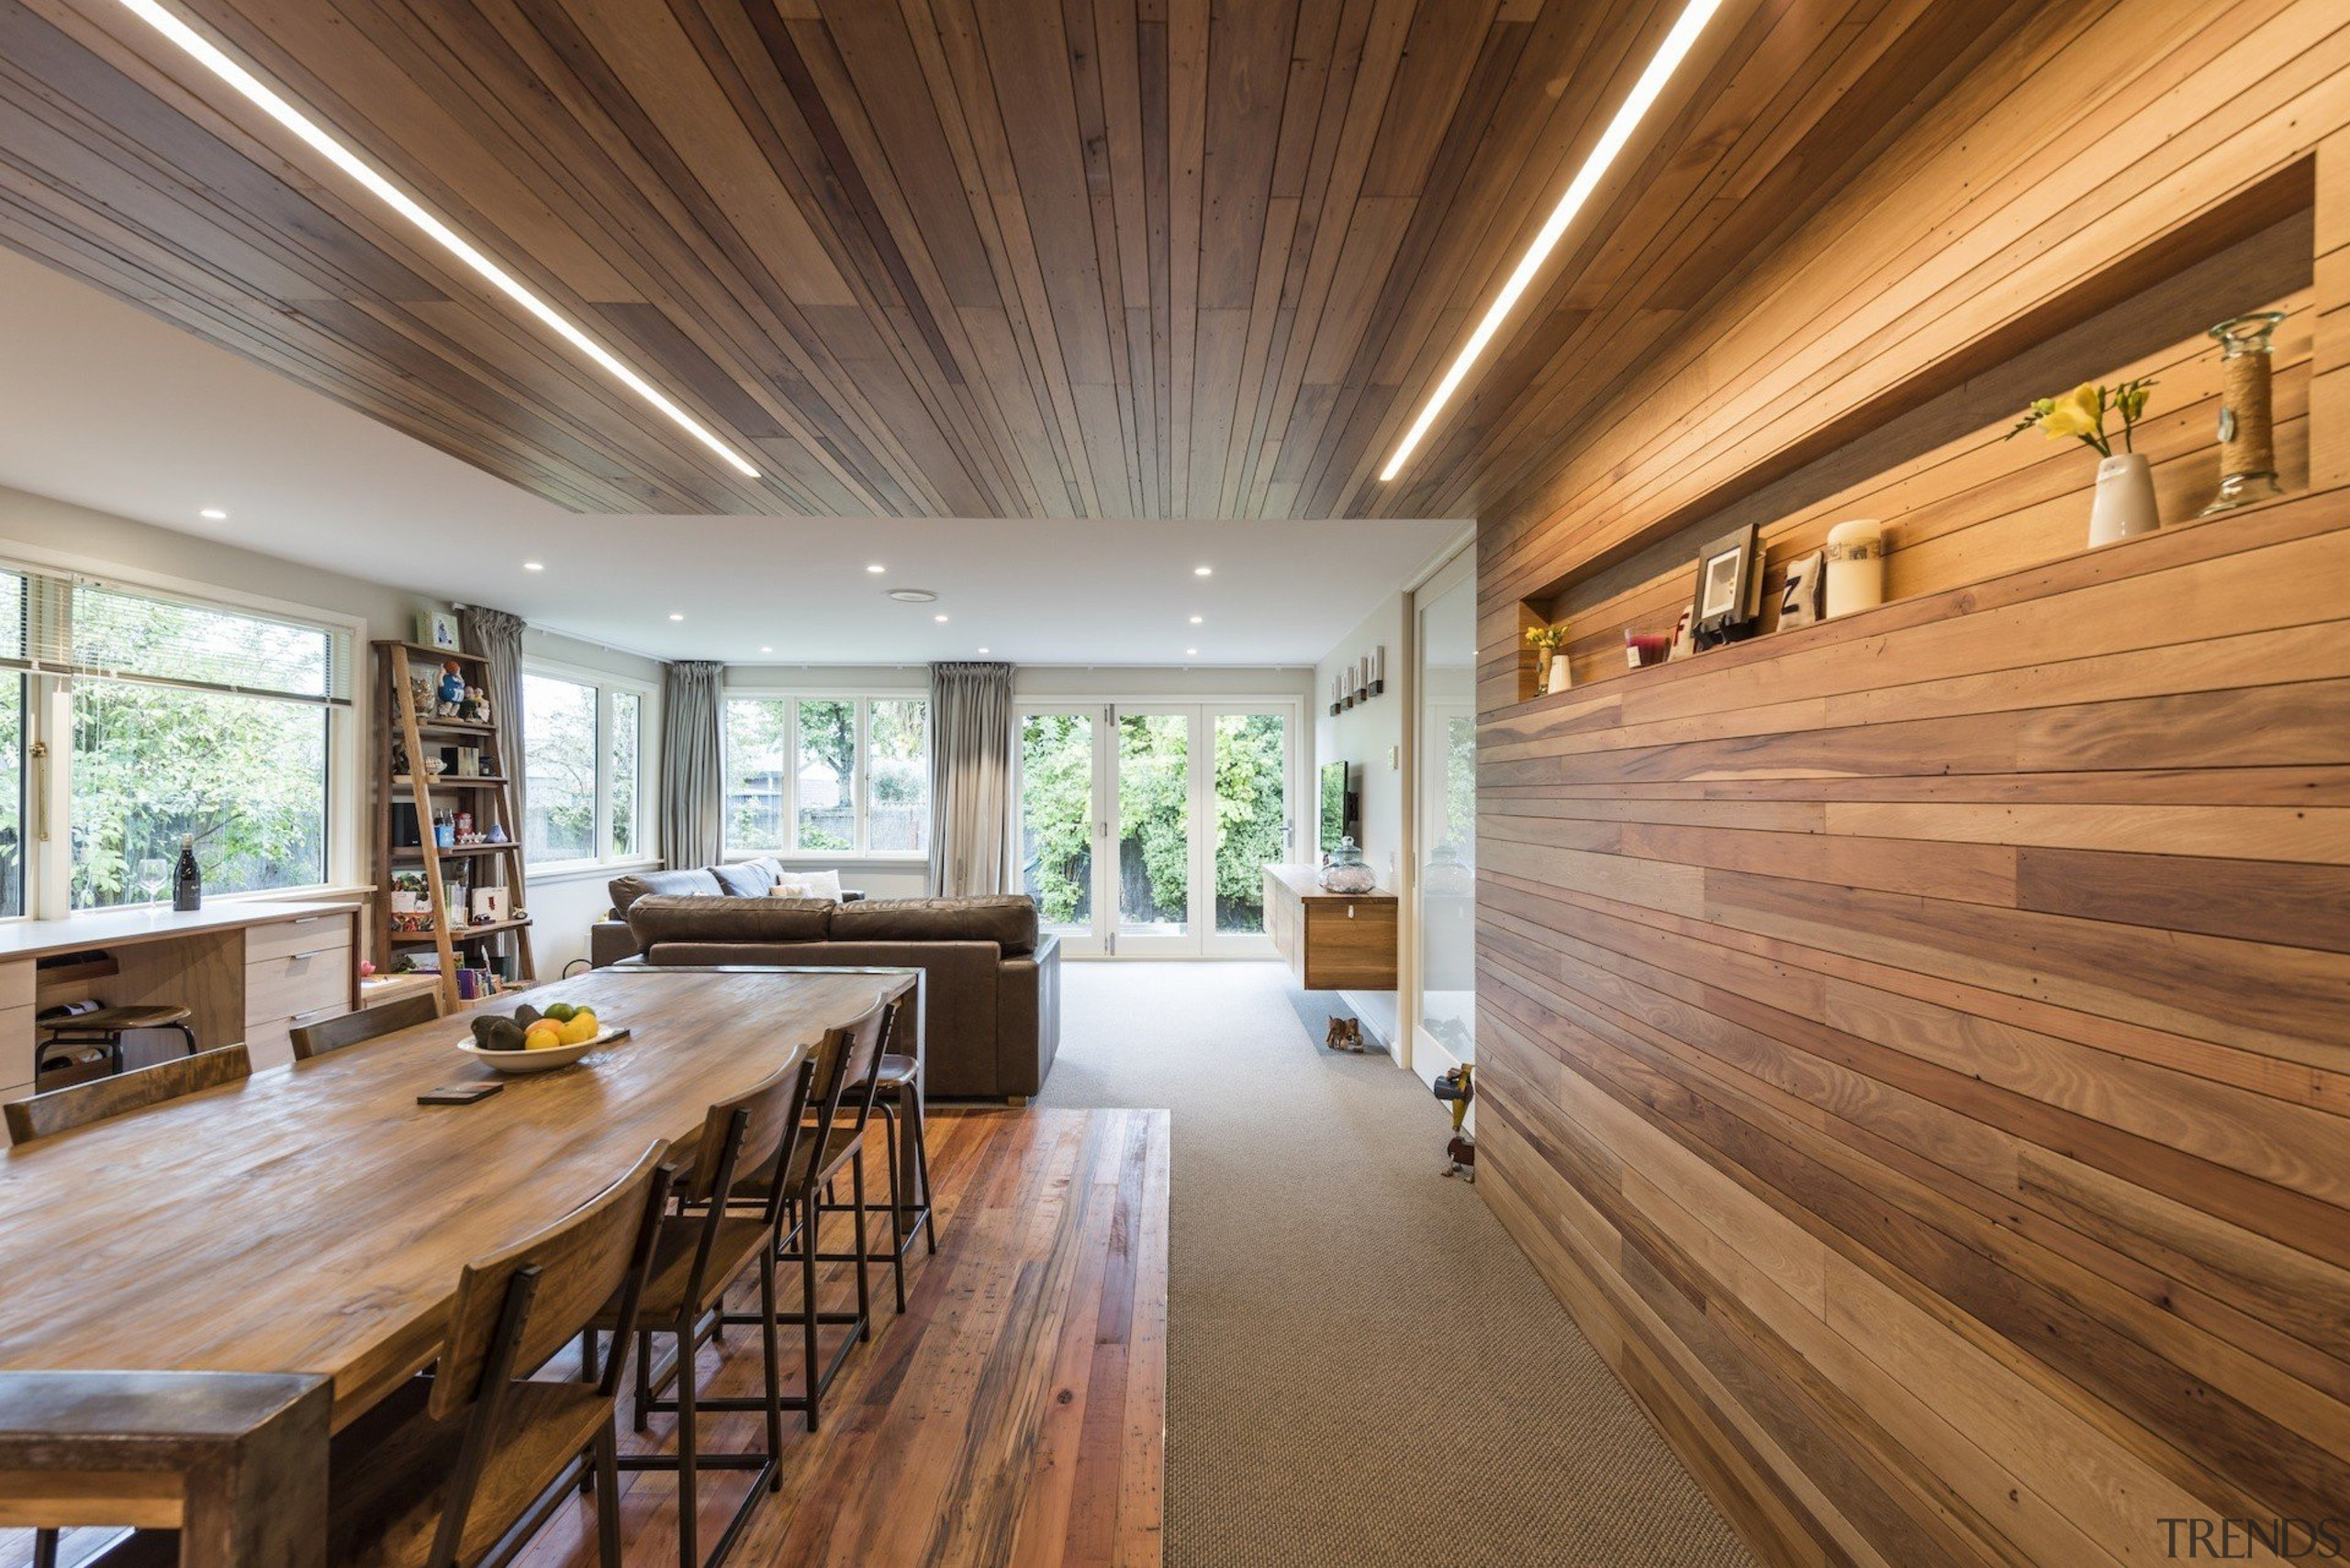 Higham Architecture architecture, ceiling, daylighting, estate, floor, flooring, hardwood, home, house, interior design, living room, real estate, wood, wood flooring, brown